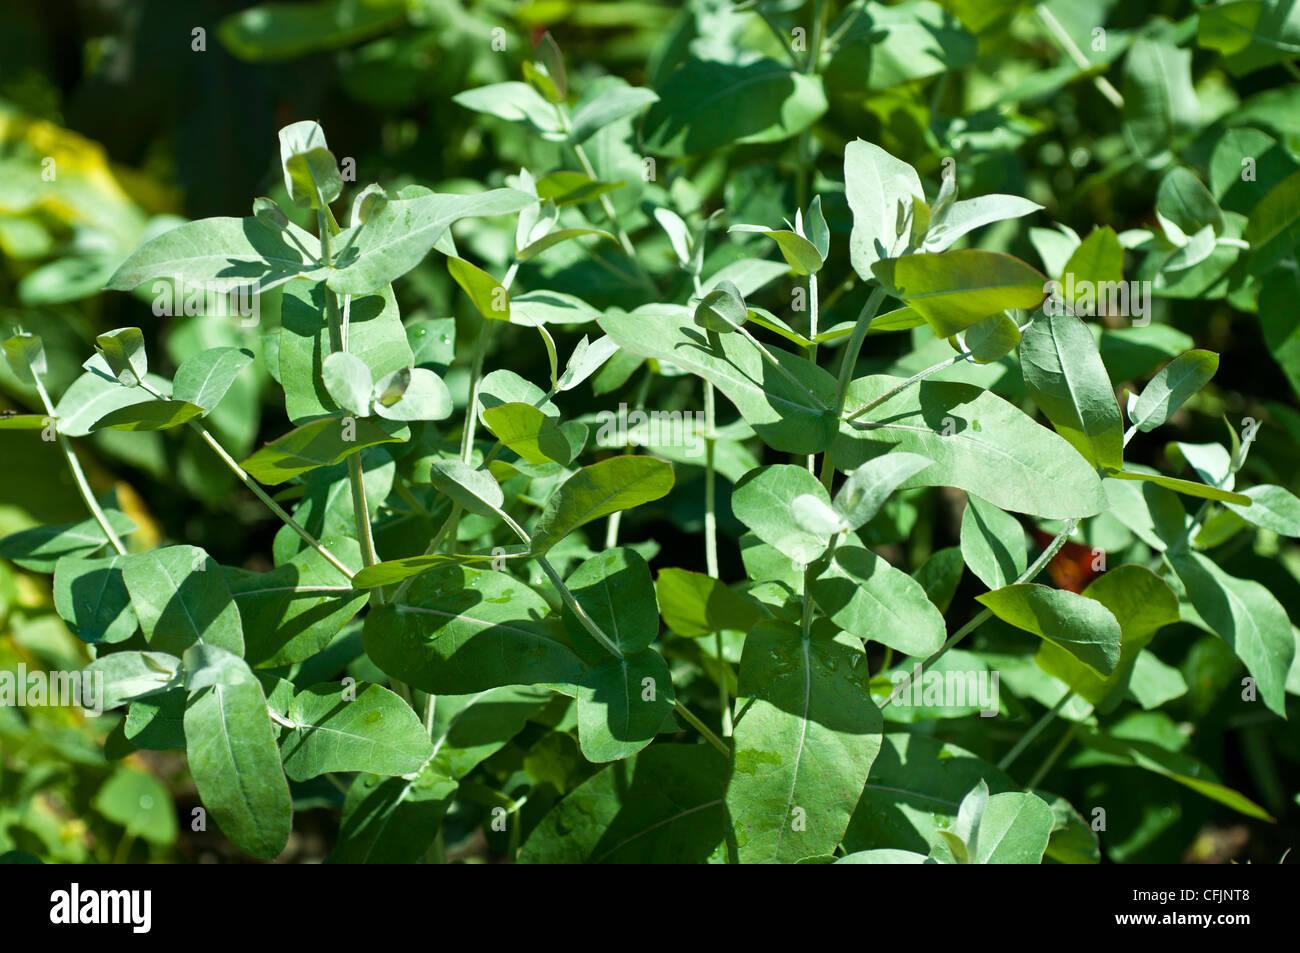 Tasmanian Blue Gum, Eucalyptus Globulus, Myrtaceae - Stock Image